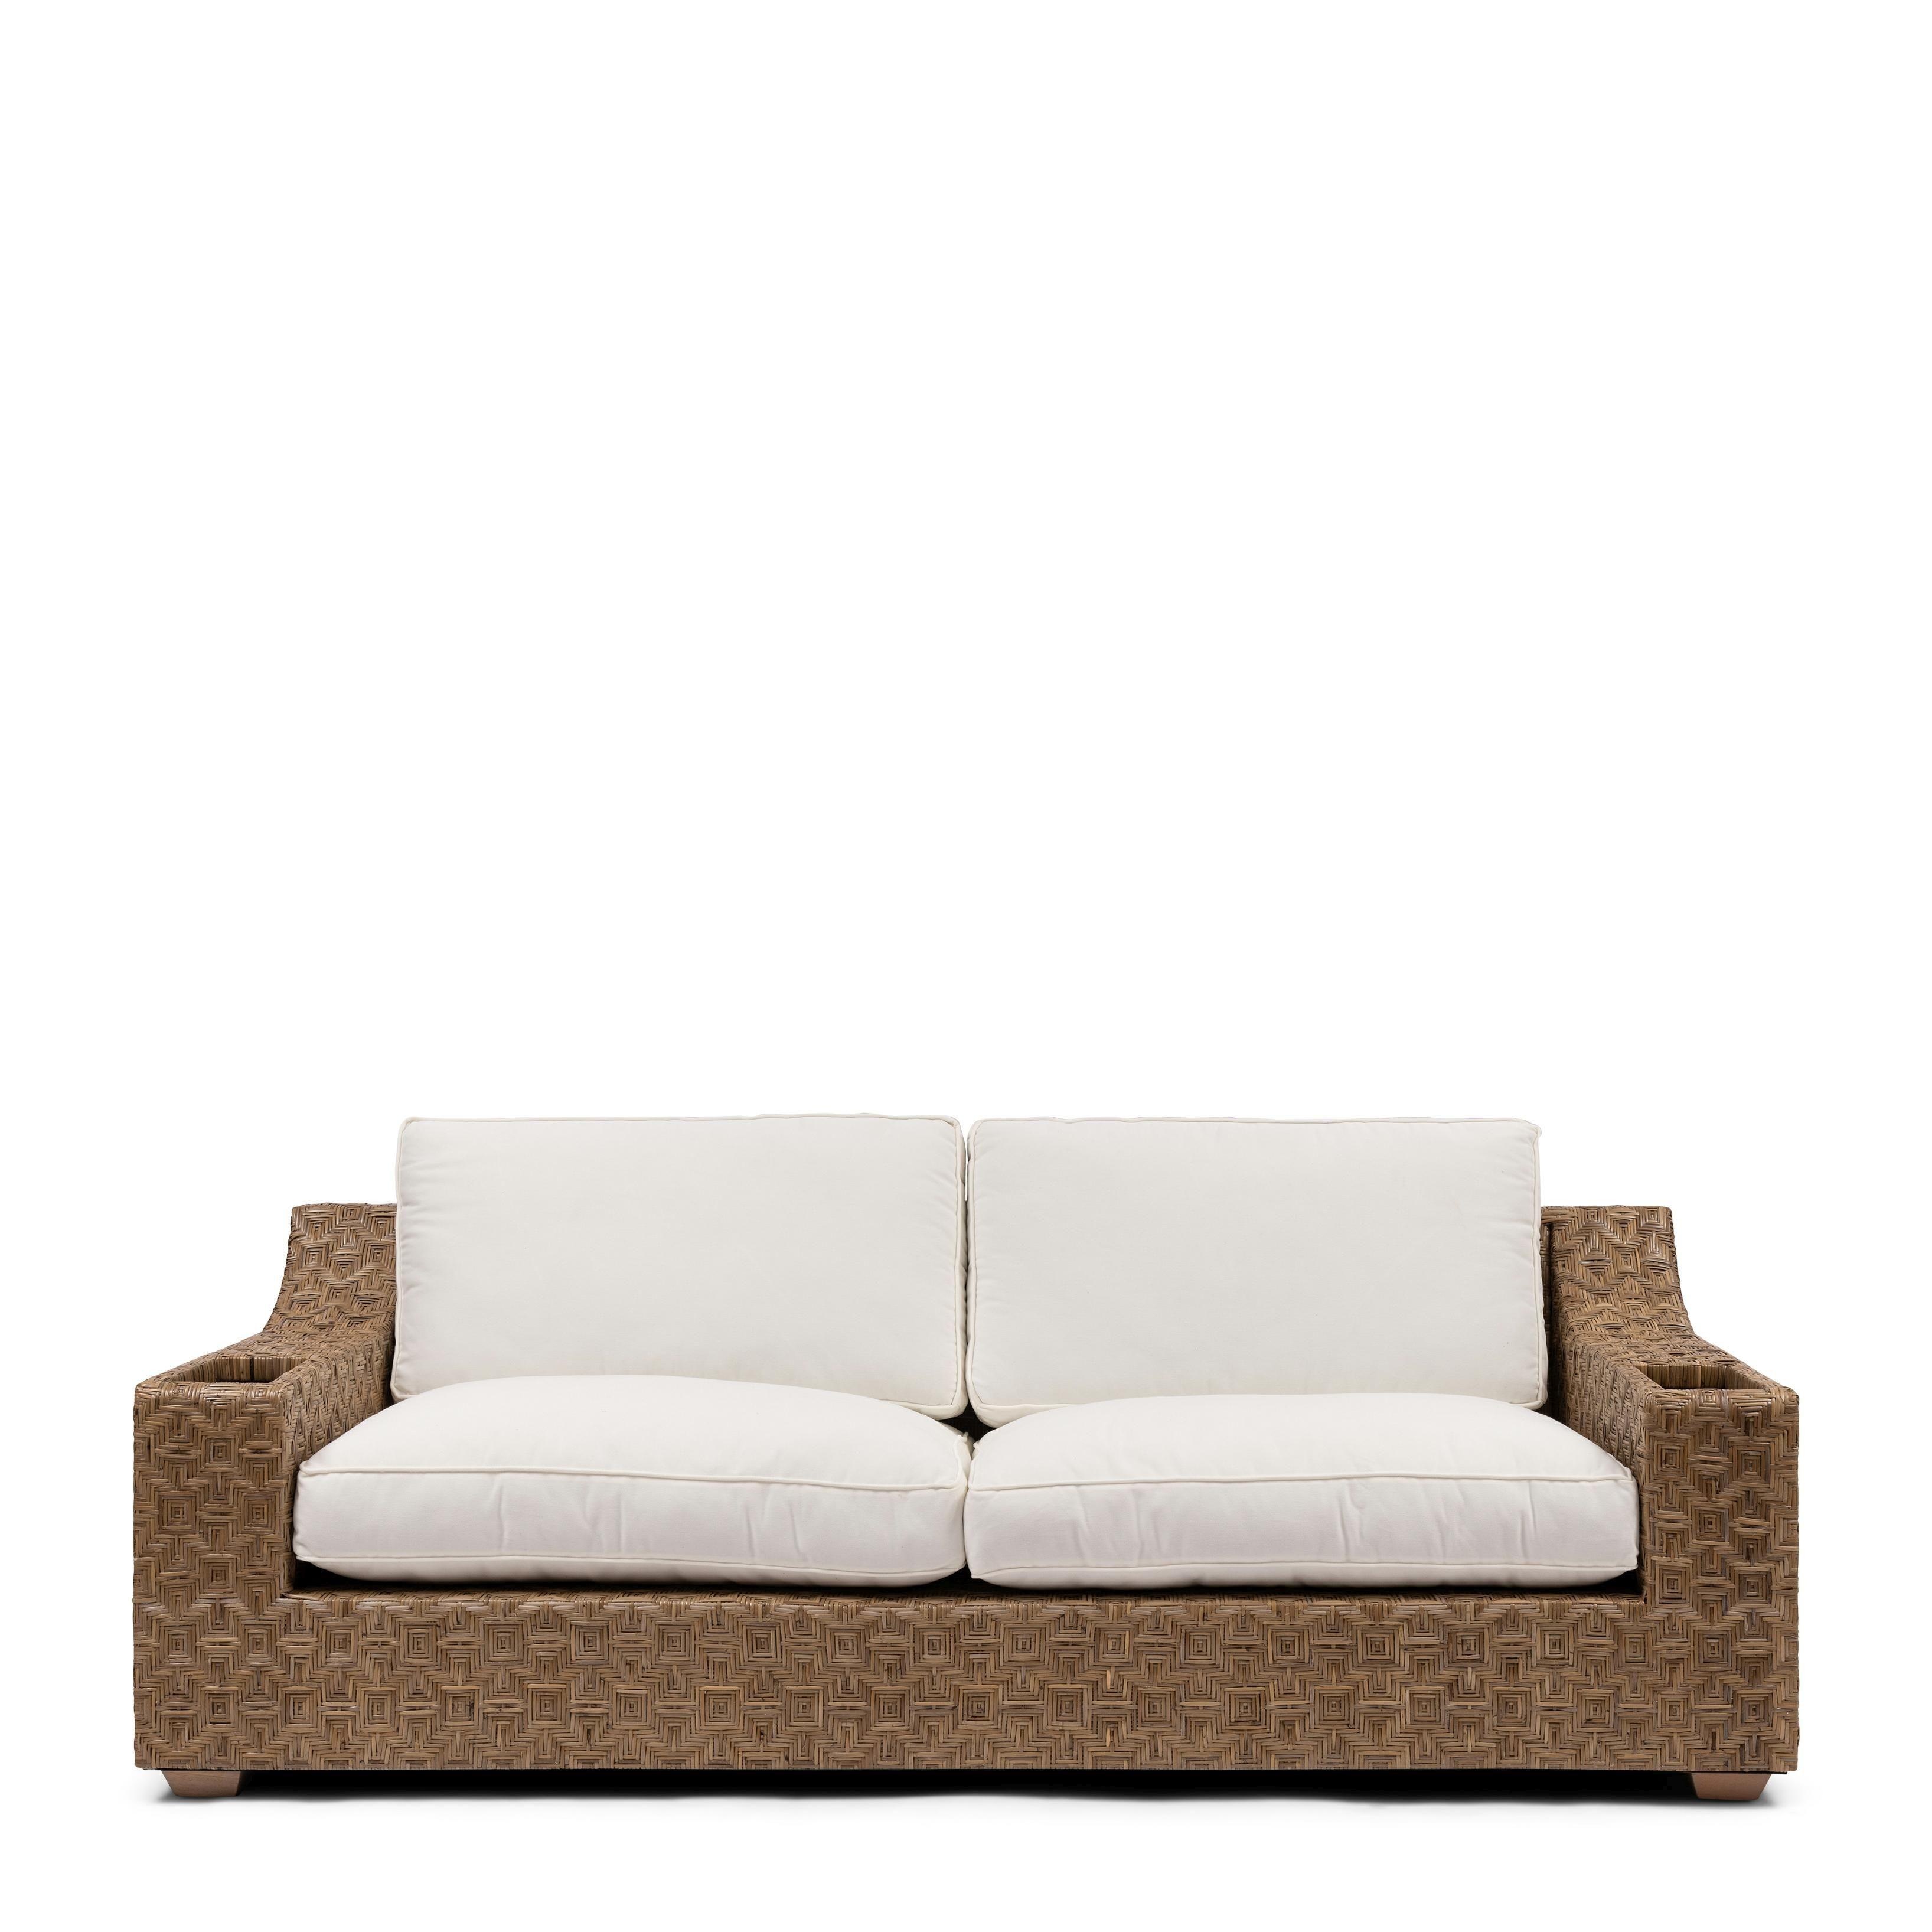 Canggu Sofa 3 Seater / Rivièra Maison